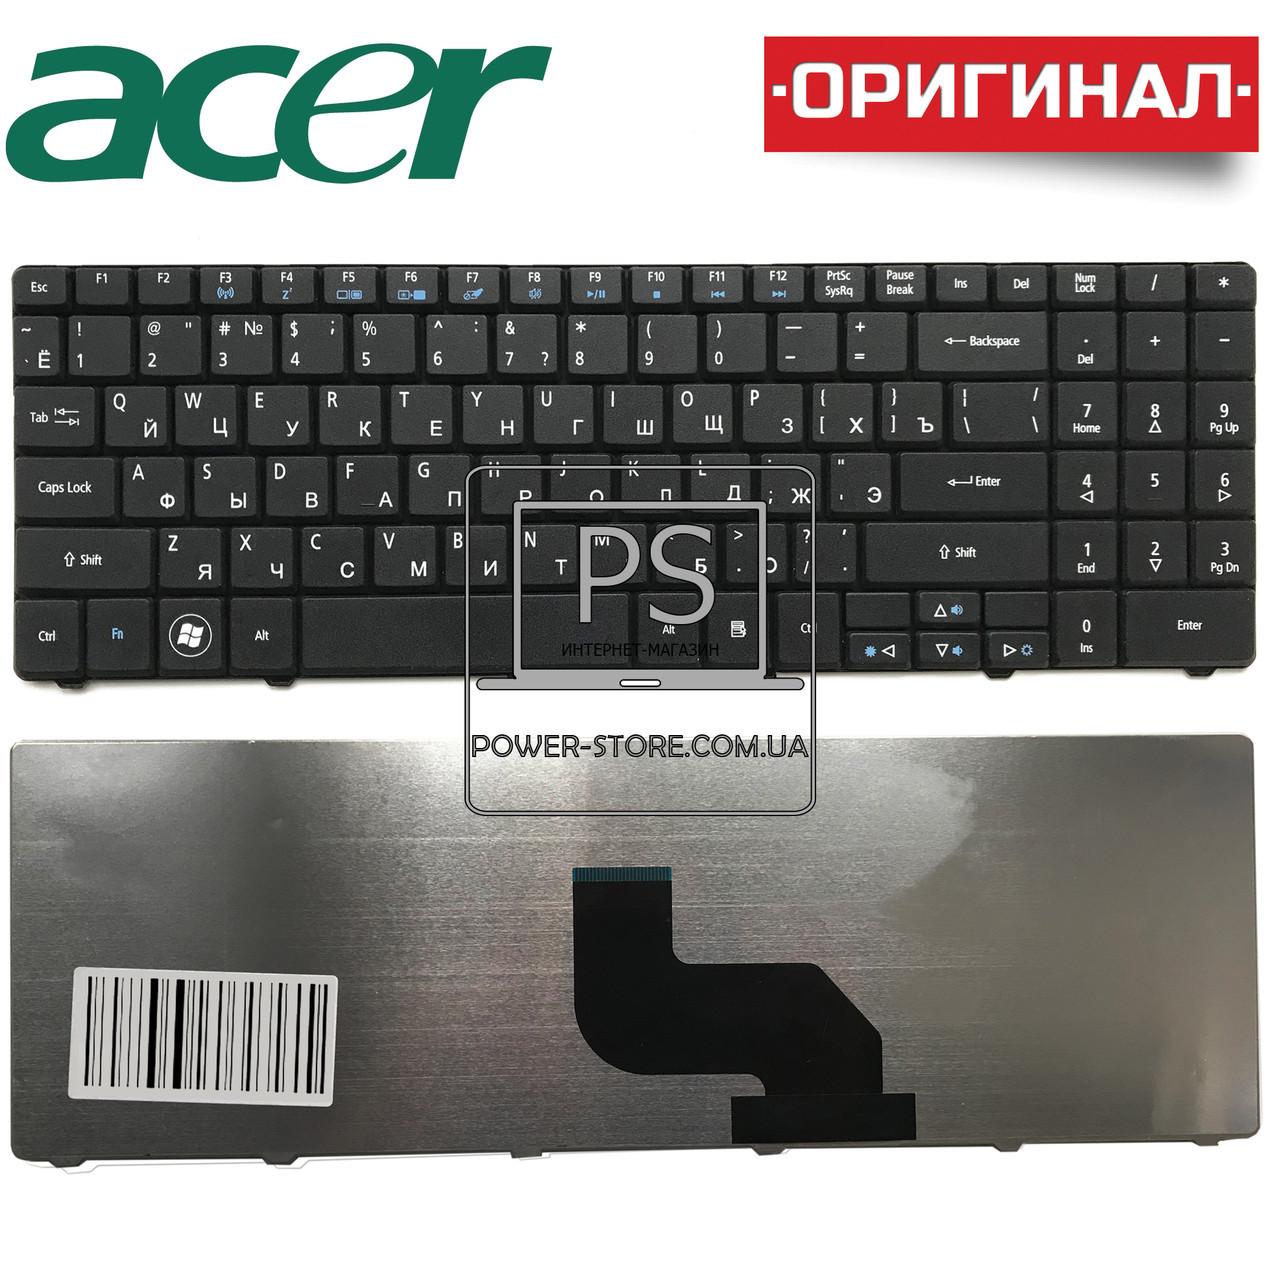 Клавиатура для ноутбука ACER PK130EI1A14, PK130EI1B06, PK130EL1B01, V120603AS2